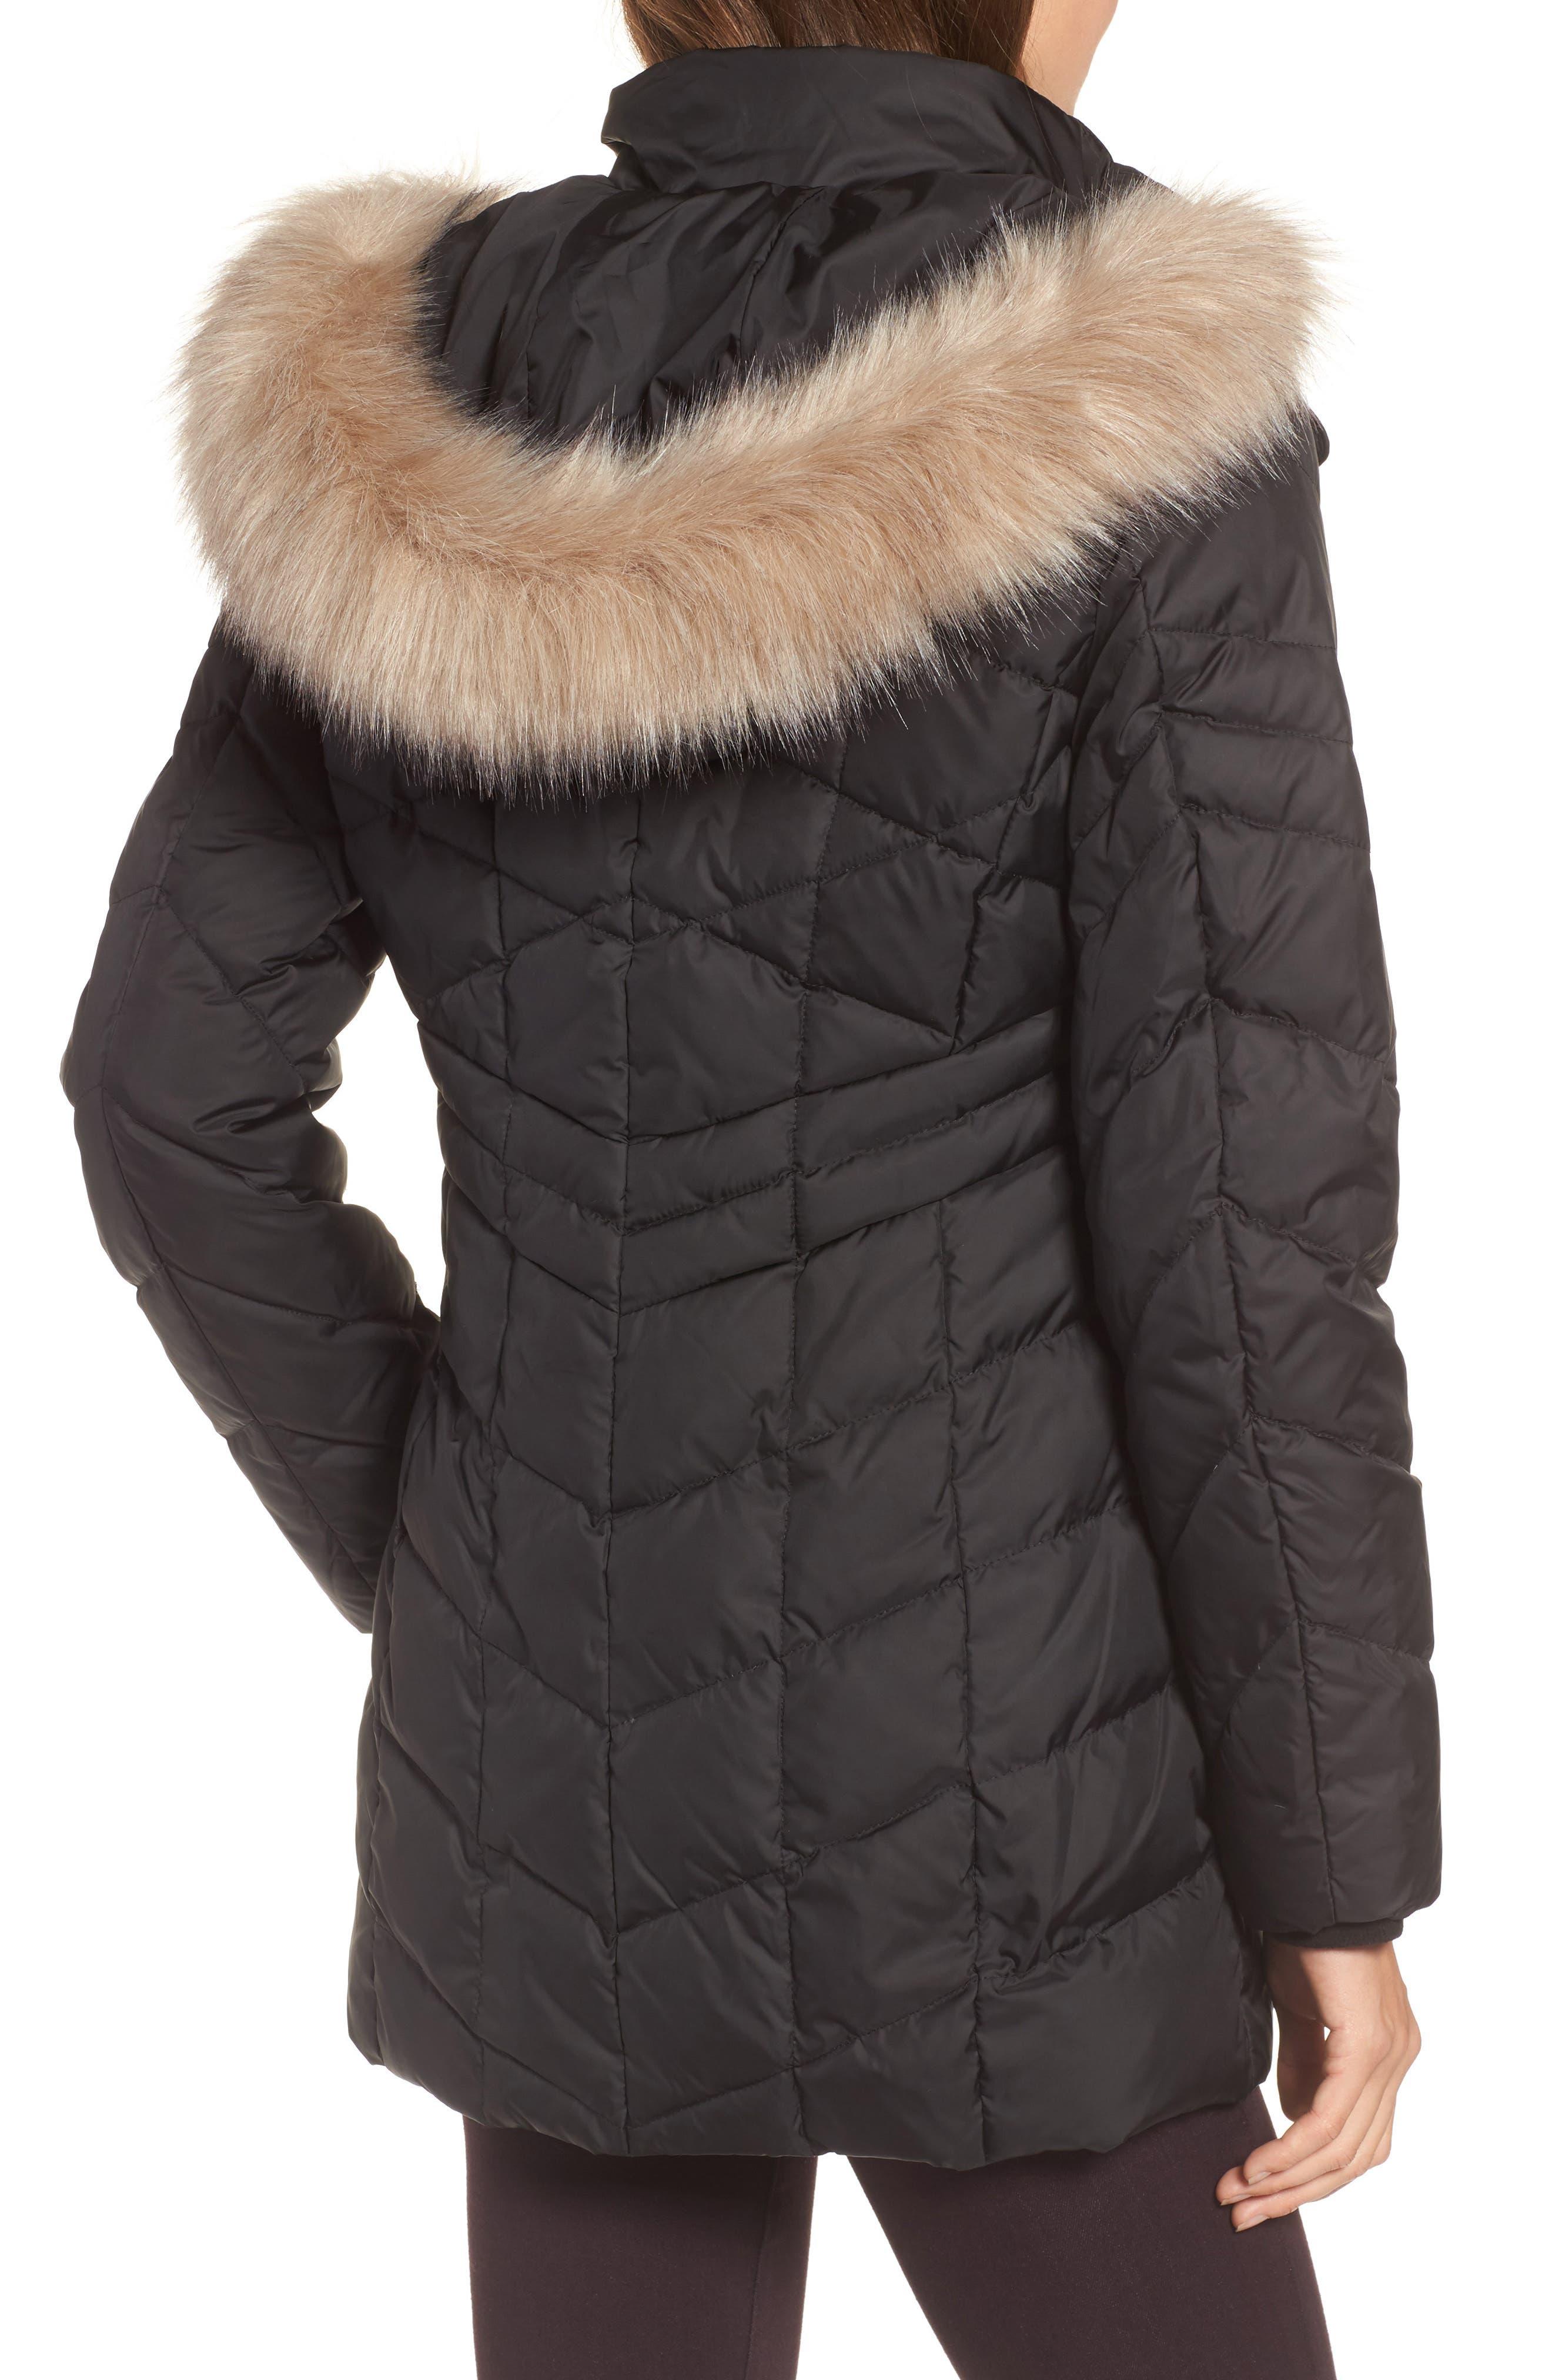 Marley 30 Coat with Detachable Faux Fur,                             Alternate thumbnail 2, color,                             001